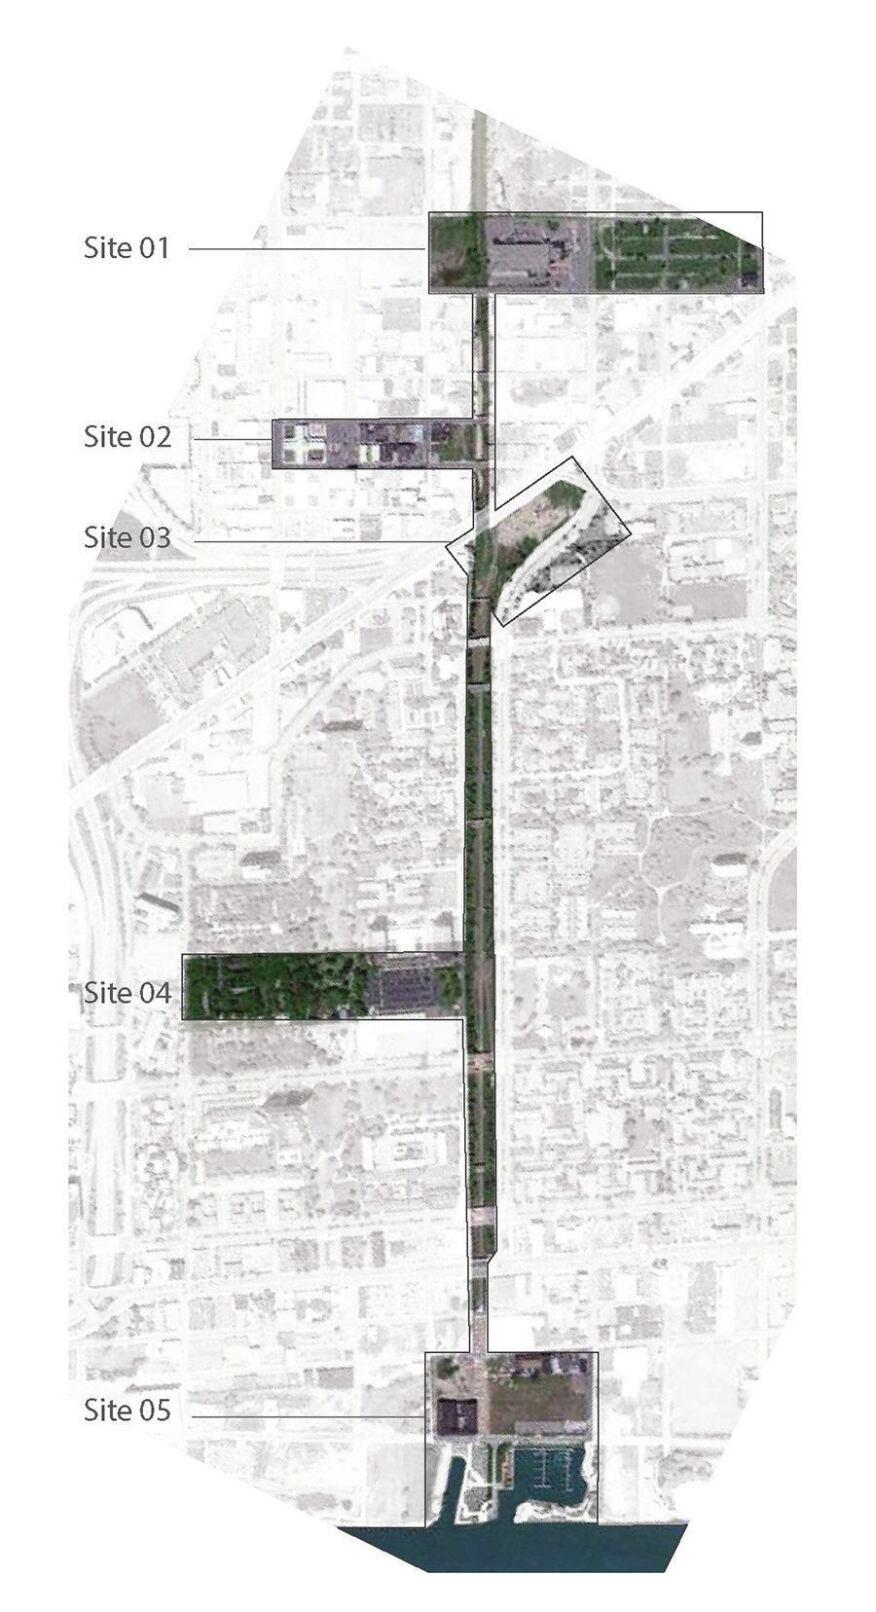 A site map for Liquid Planning Detroit.